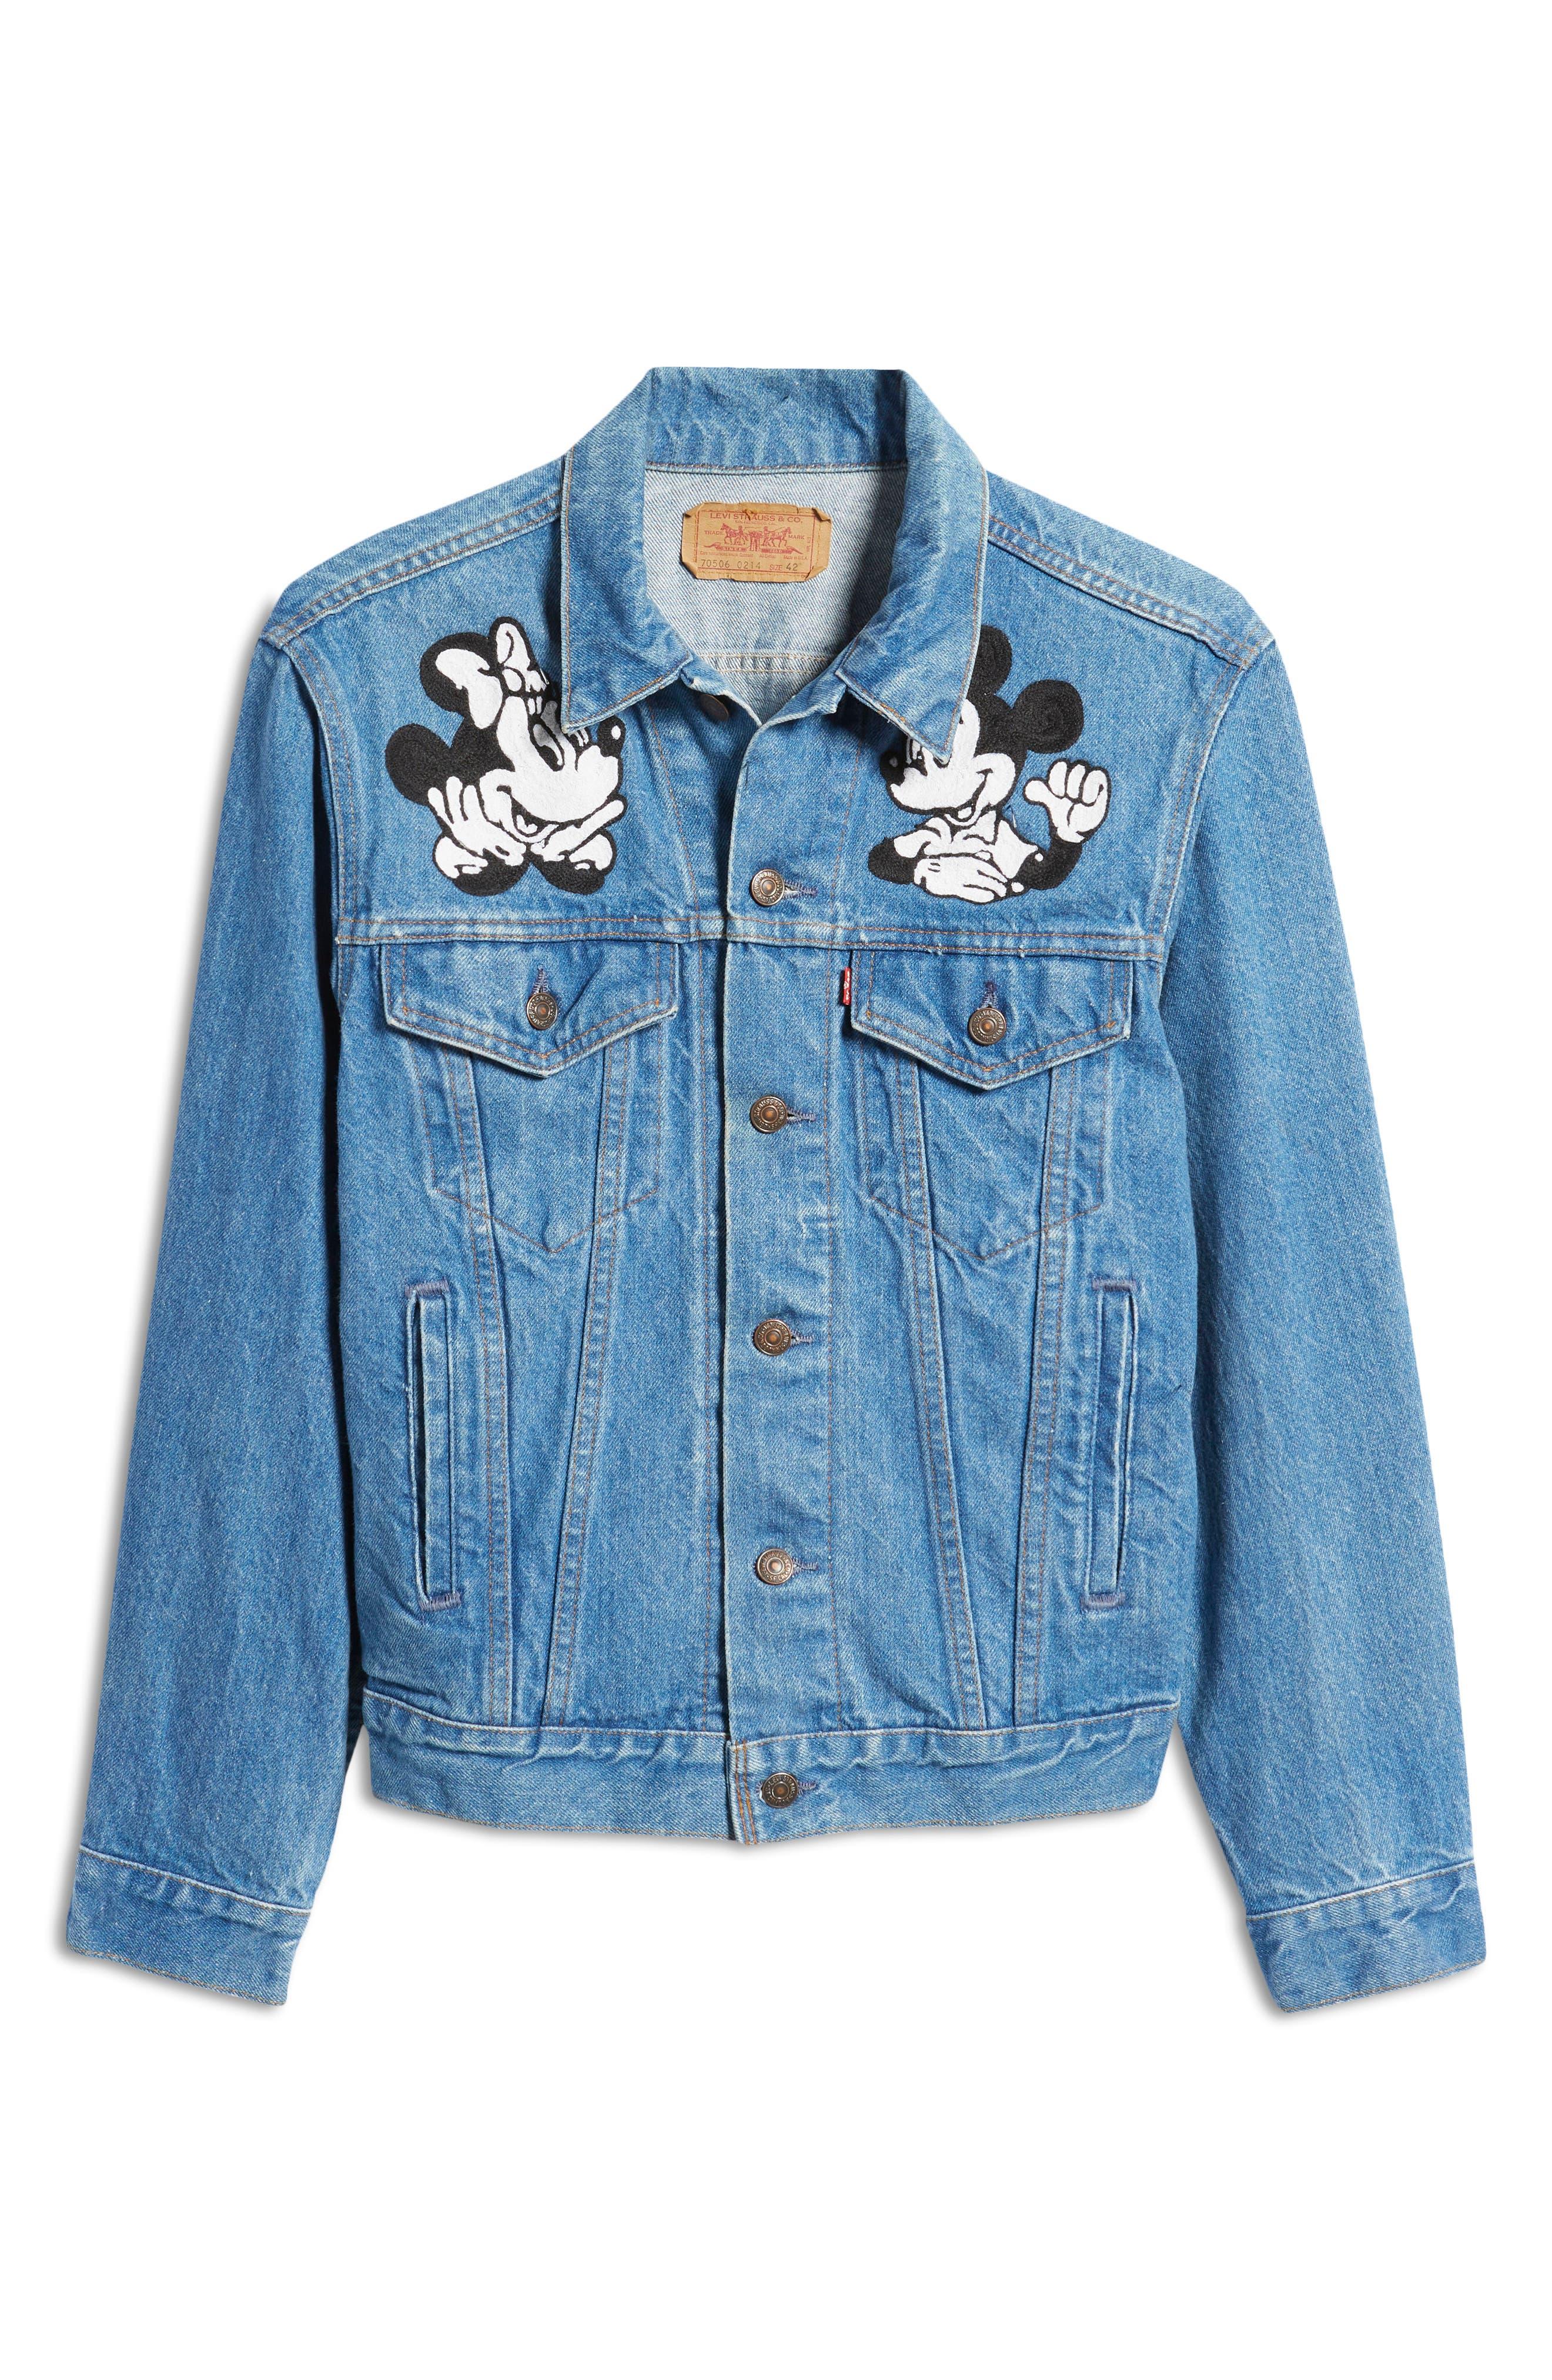 X Levi'S Unisex Reworked Vintage Mickey & Minnie Denim Jacket